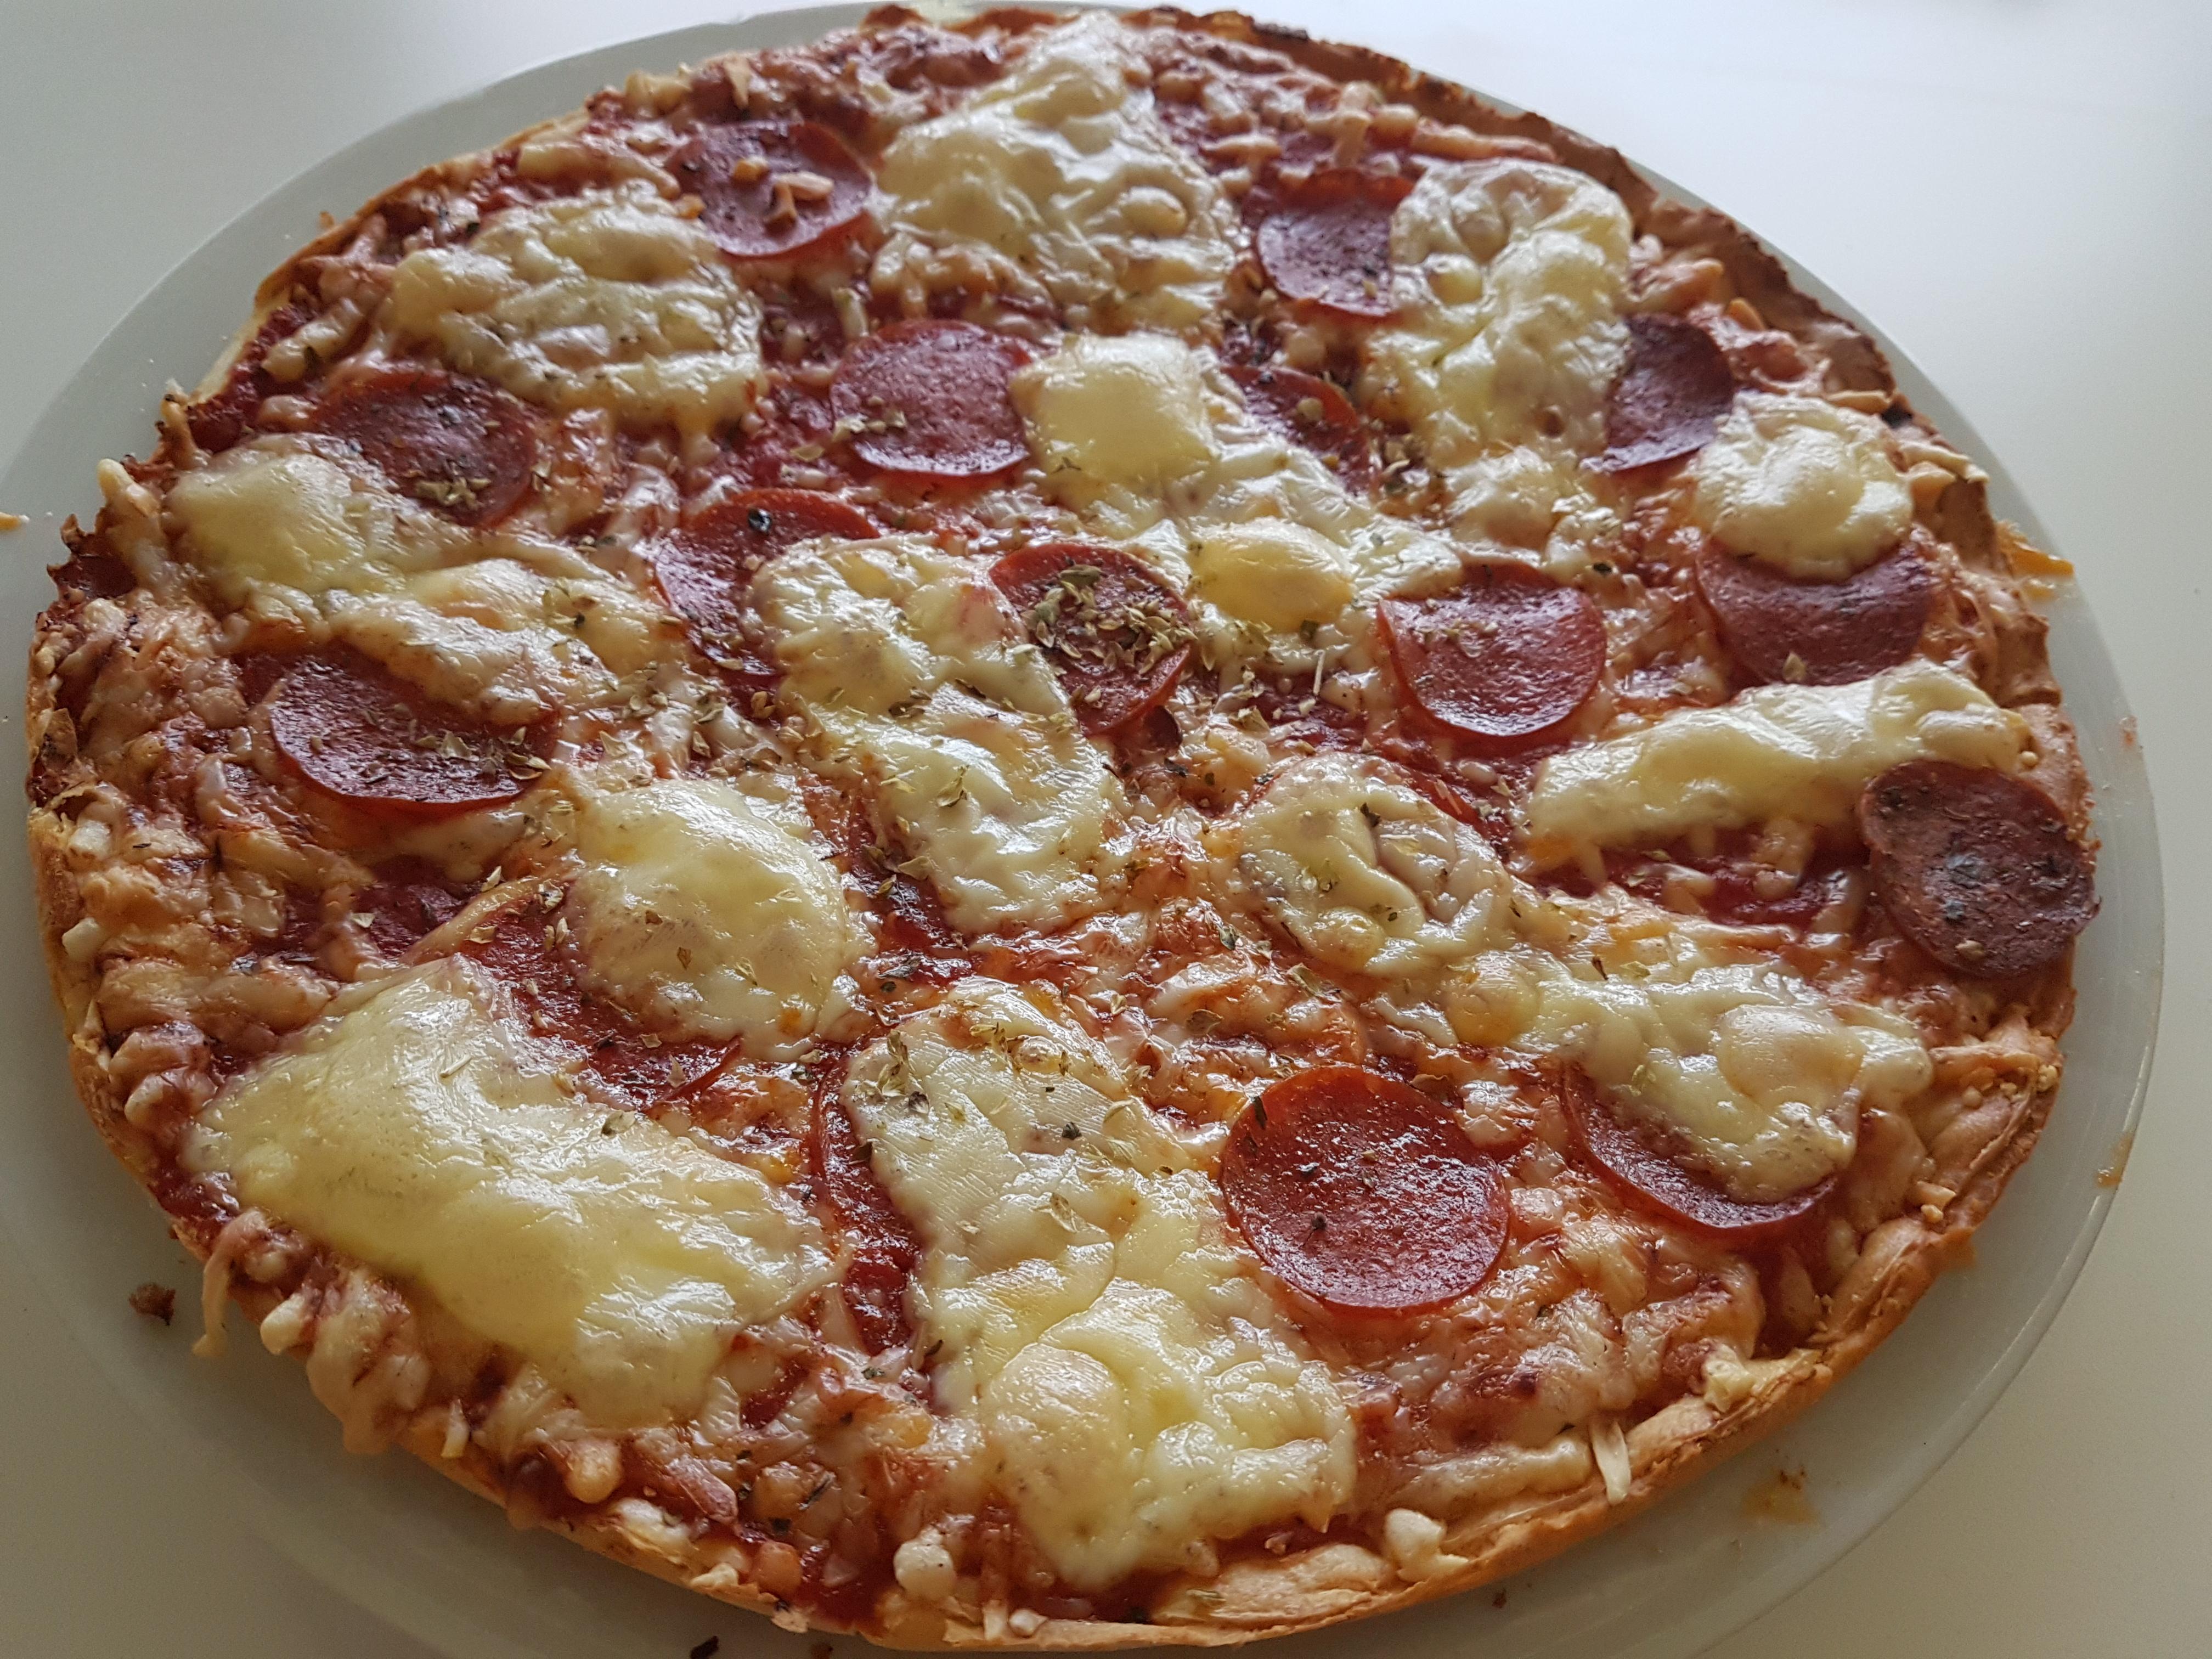 http://foodloader.net/Holz_2018-07-24_Pizza.jpg